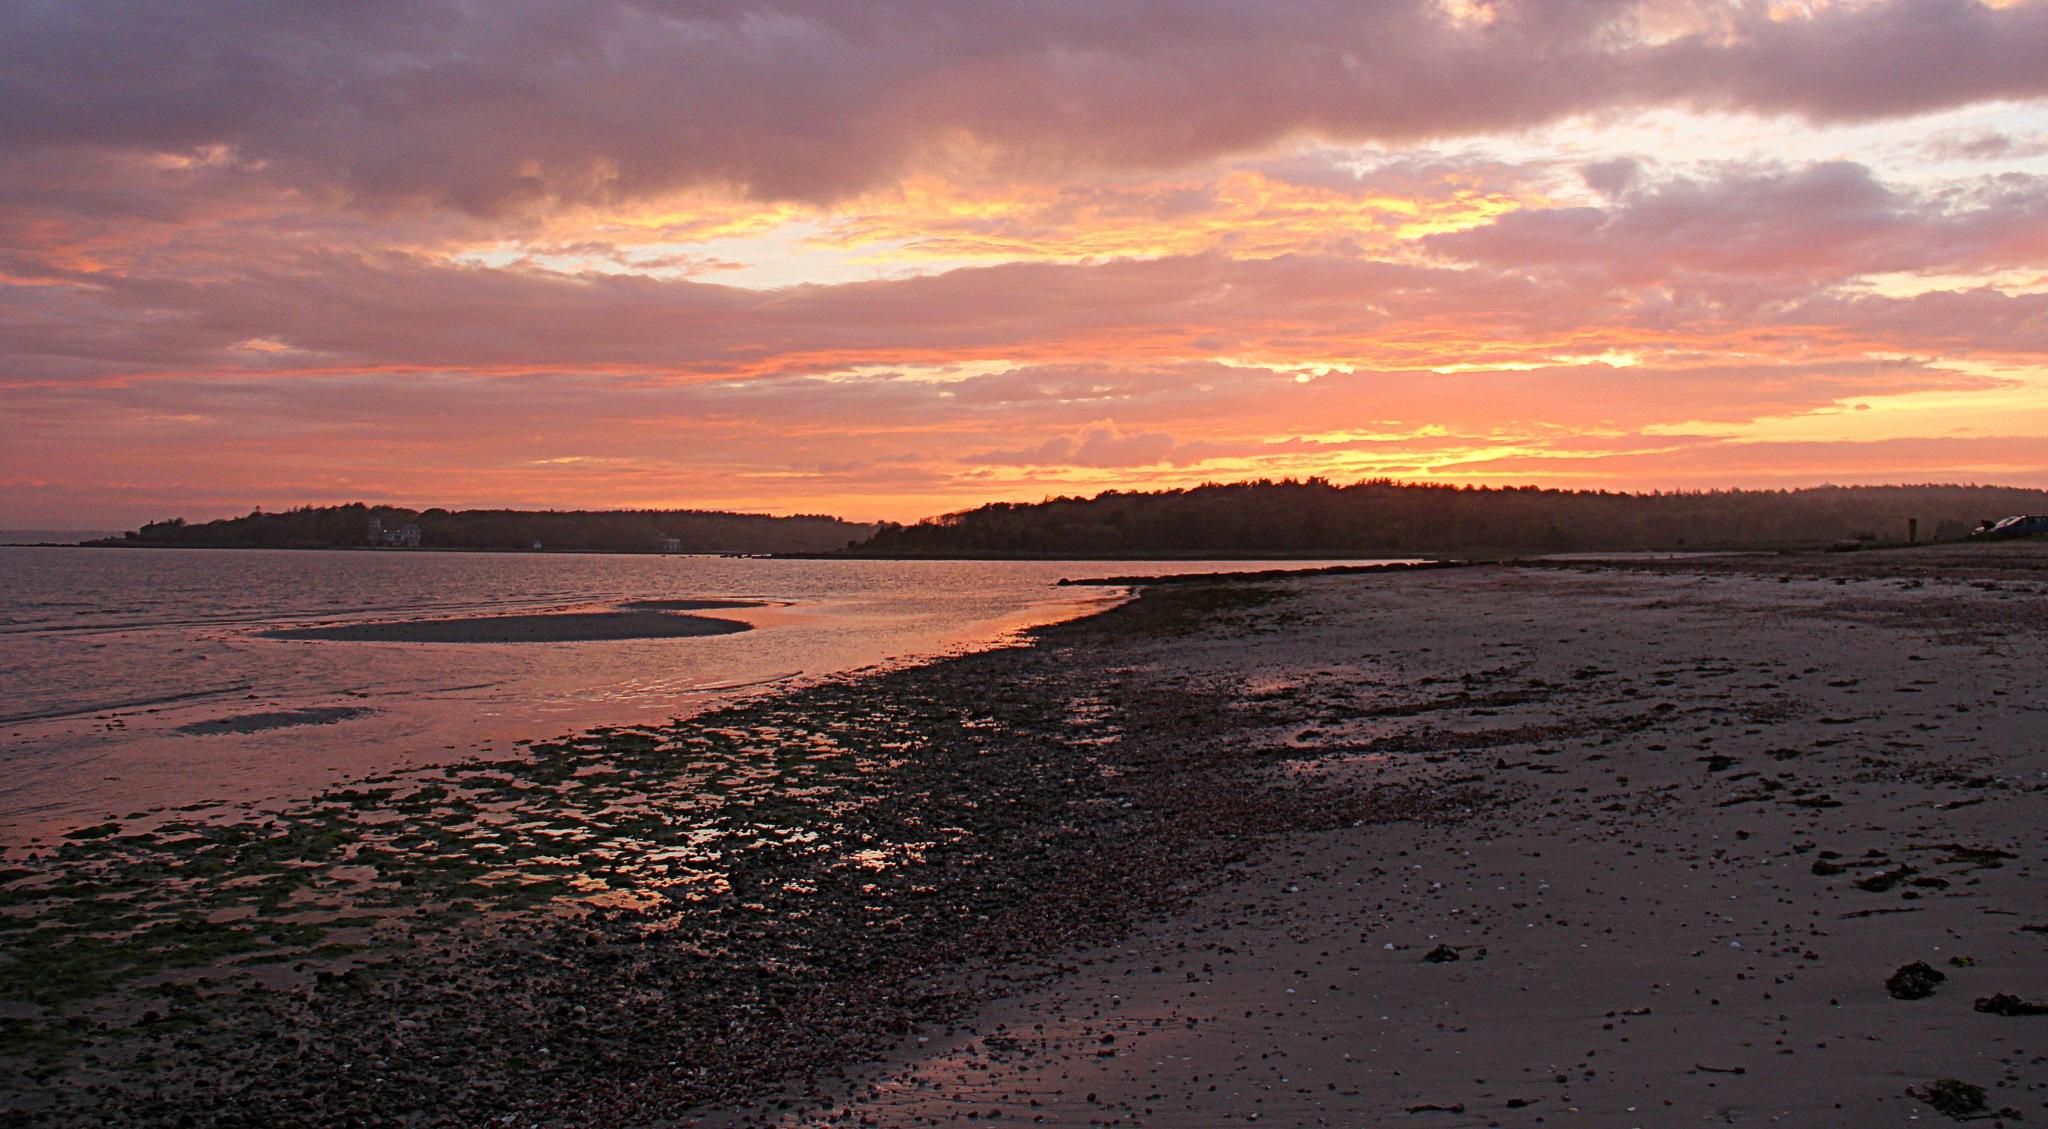 Sunset by susanne carlton